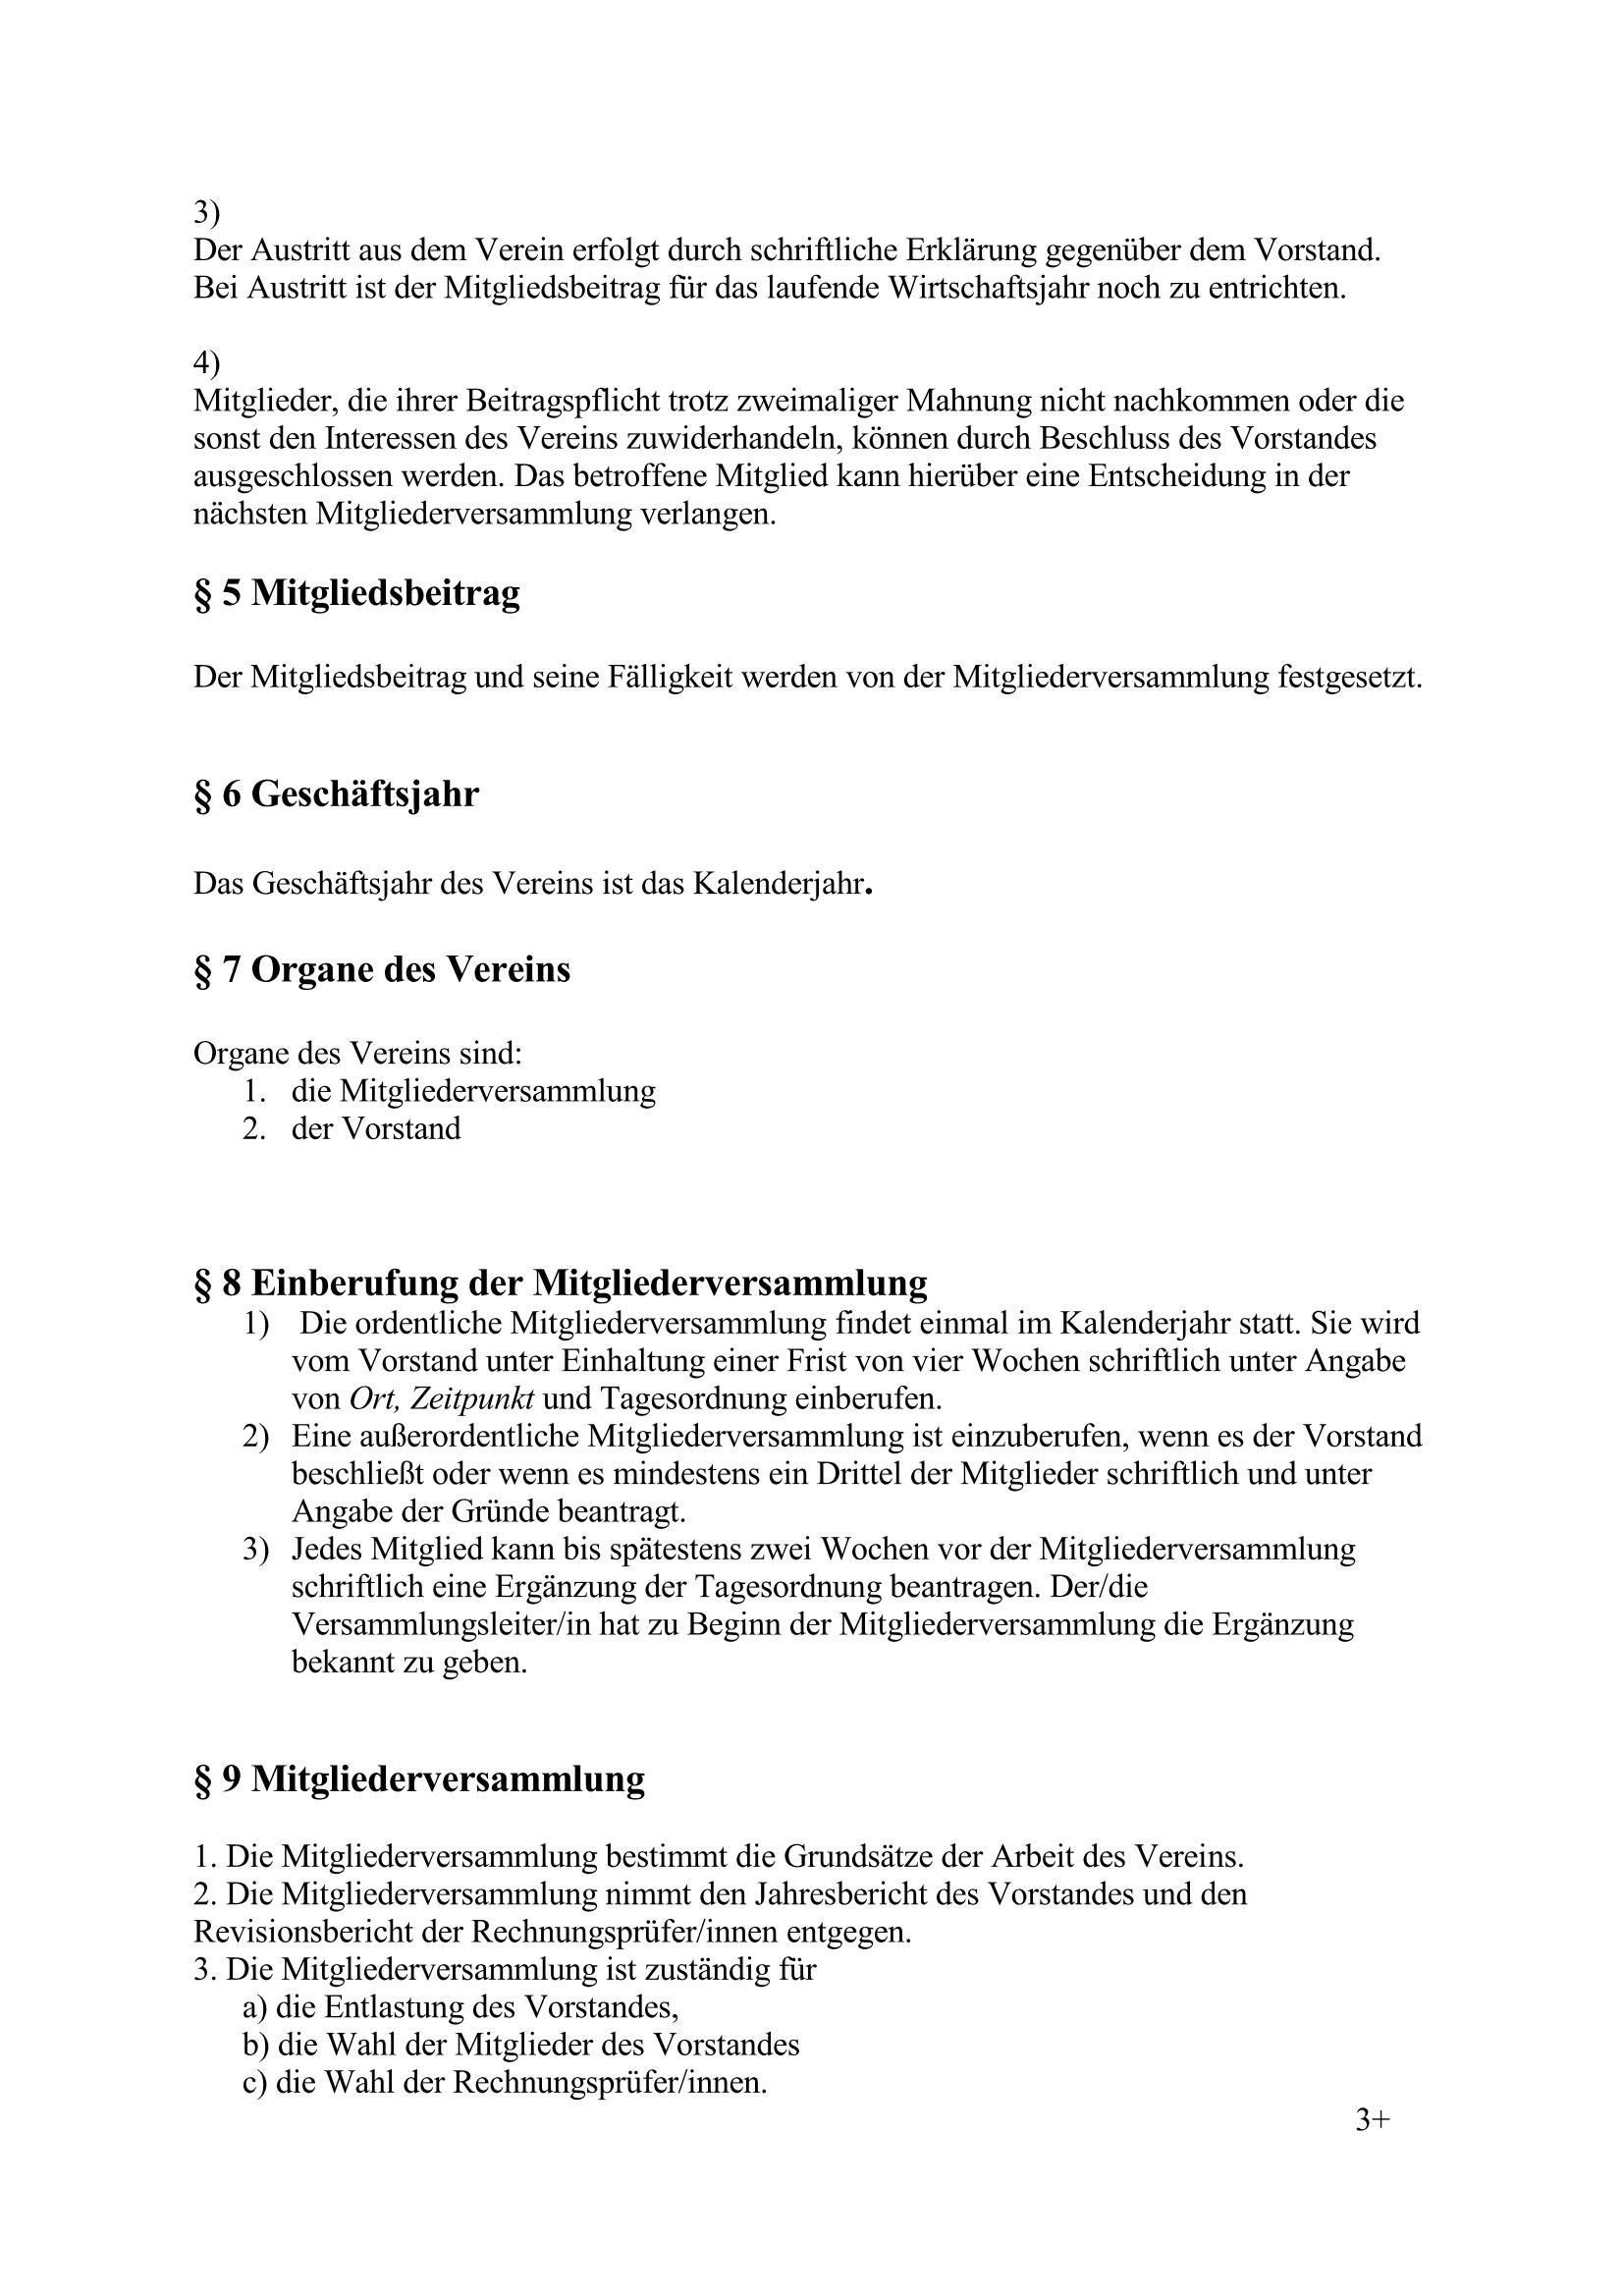 Satzung 2010.S.3